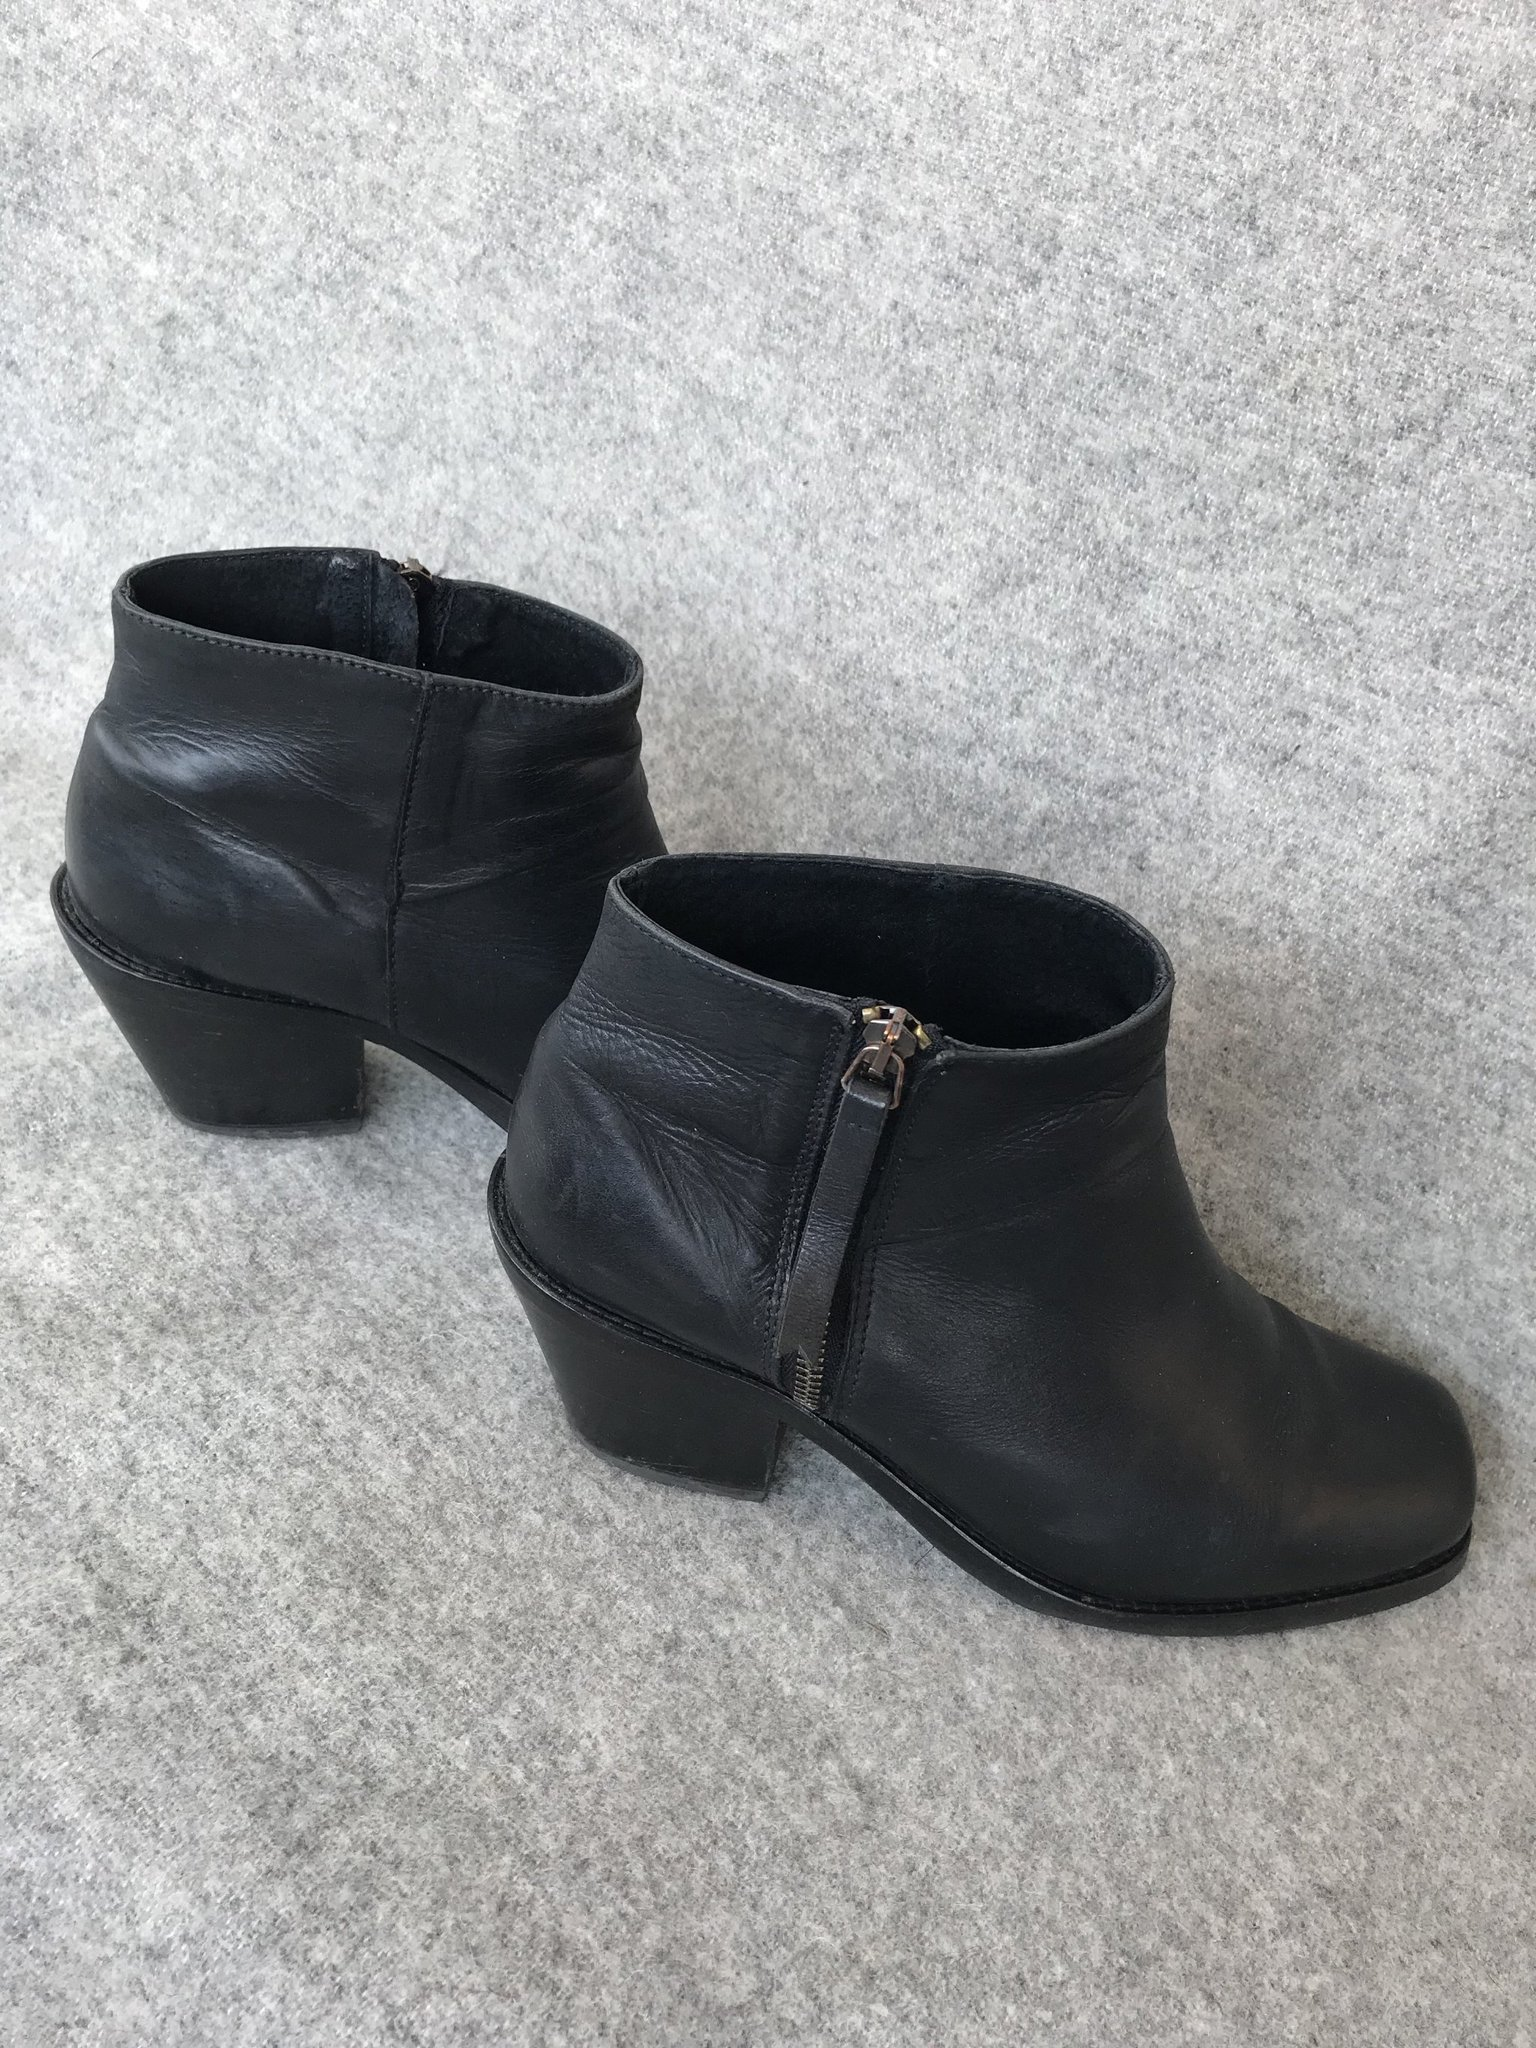 2c78ee323de Svarta ankle boots från Samsoe o Samsoe stl 41 med dragkedja på sidan ...